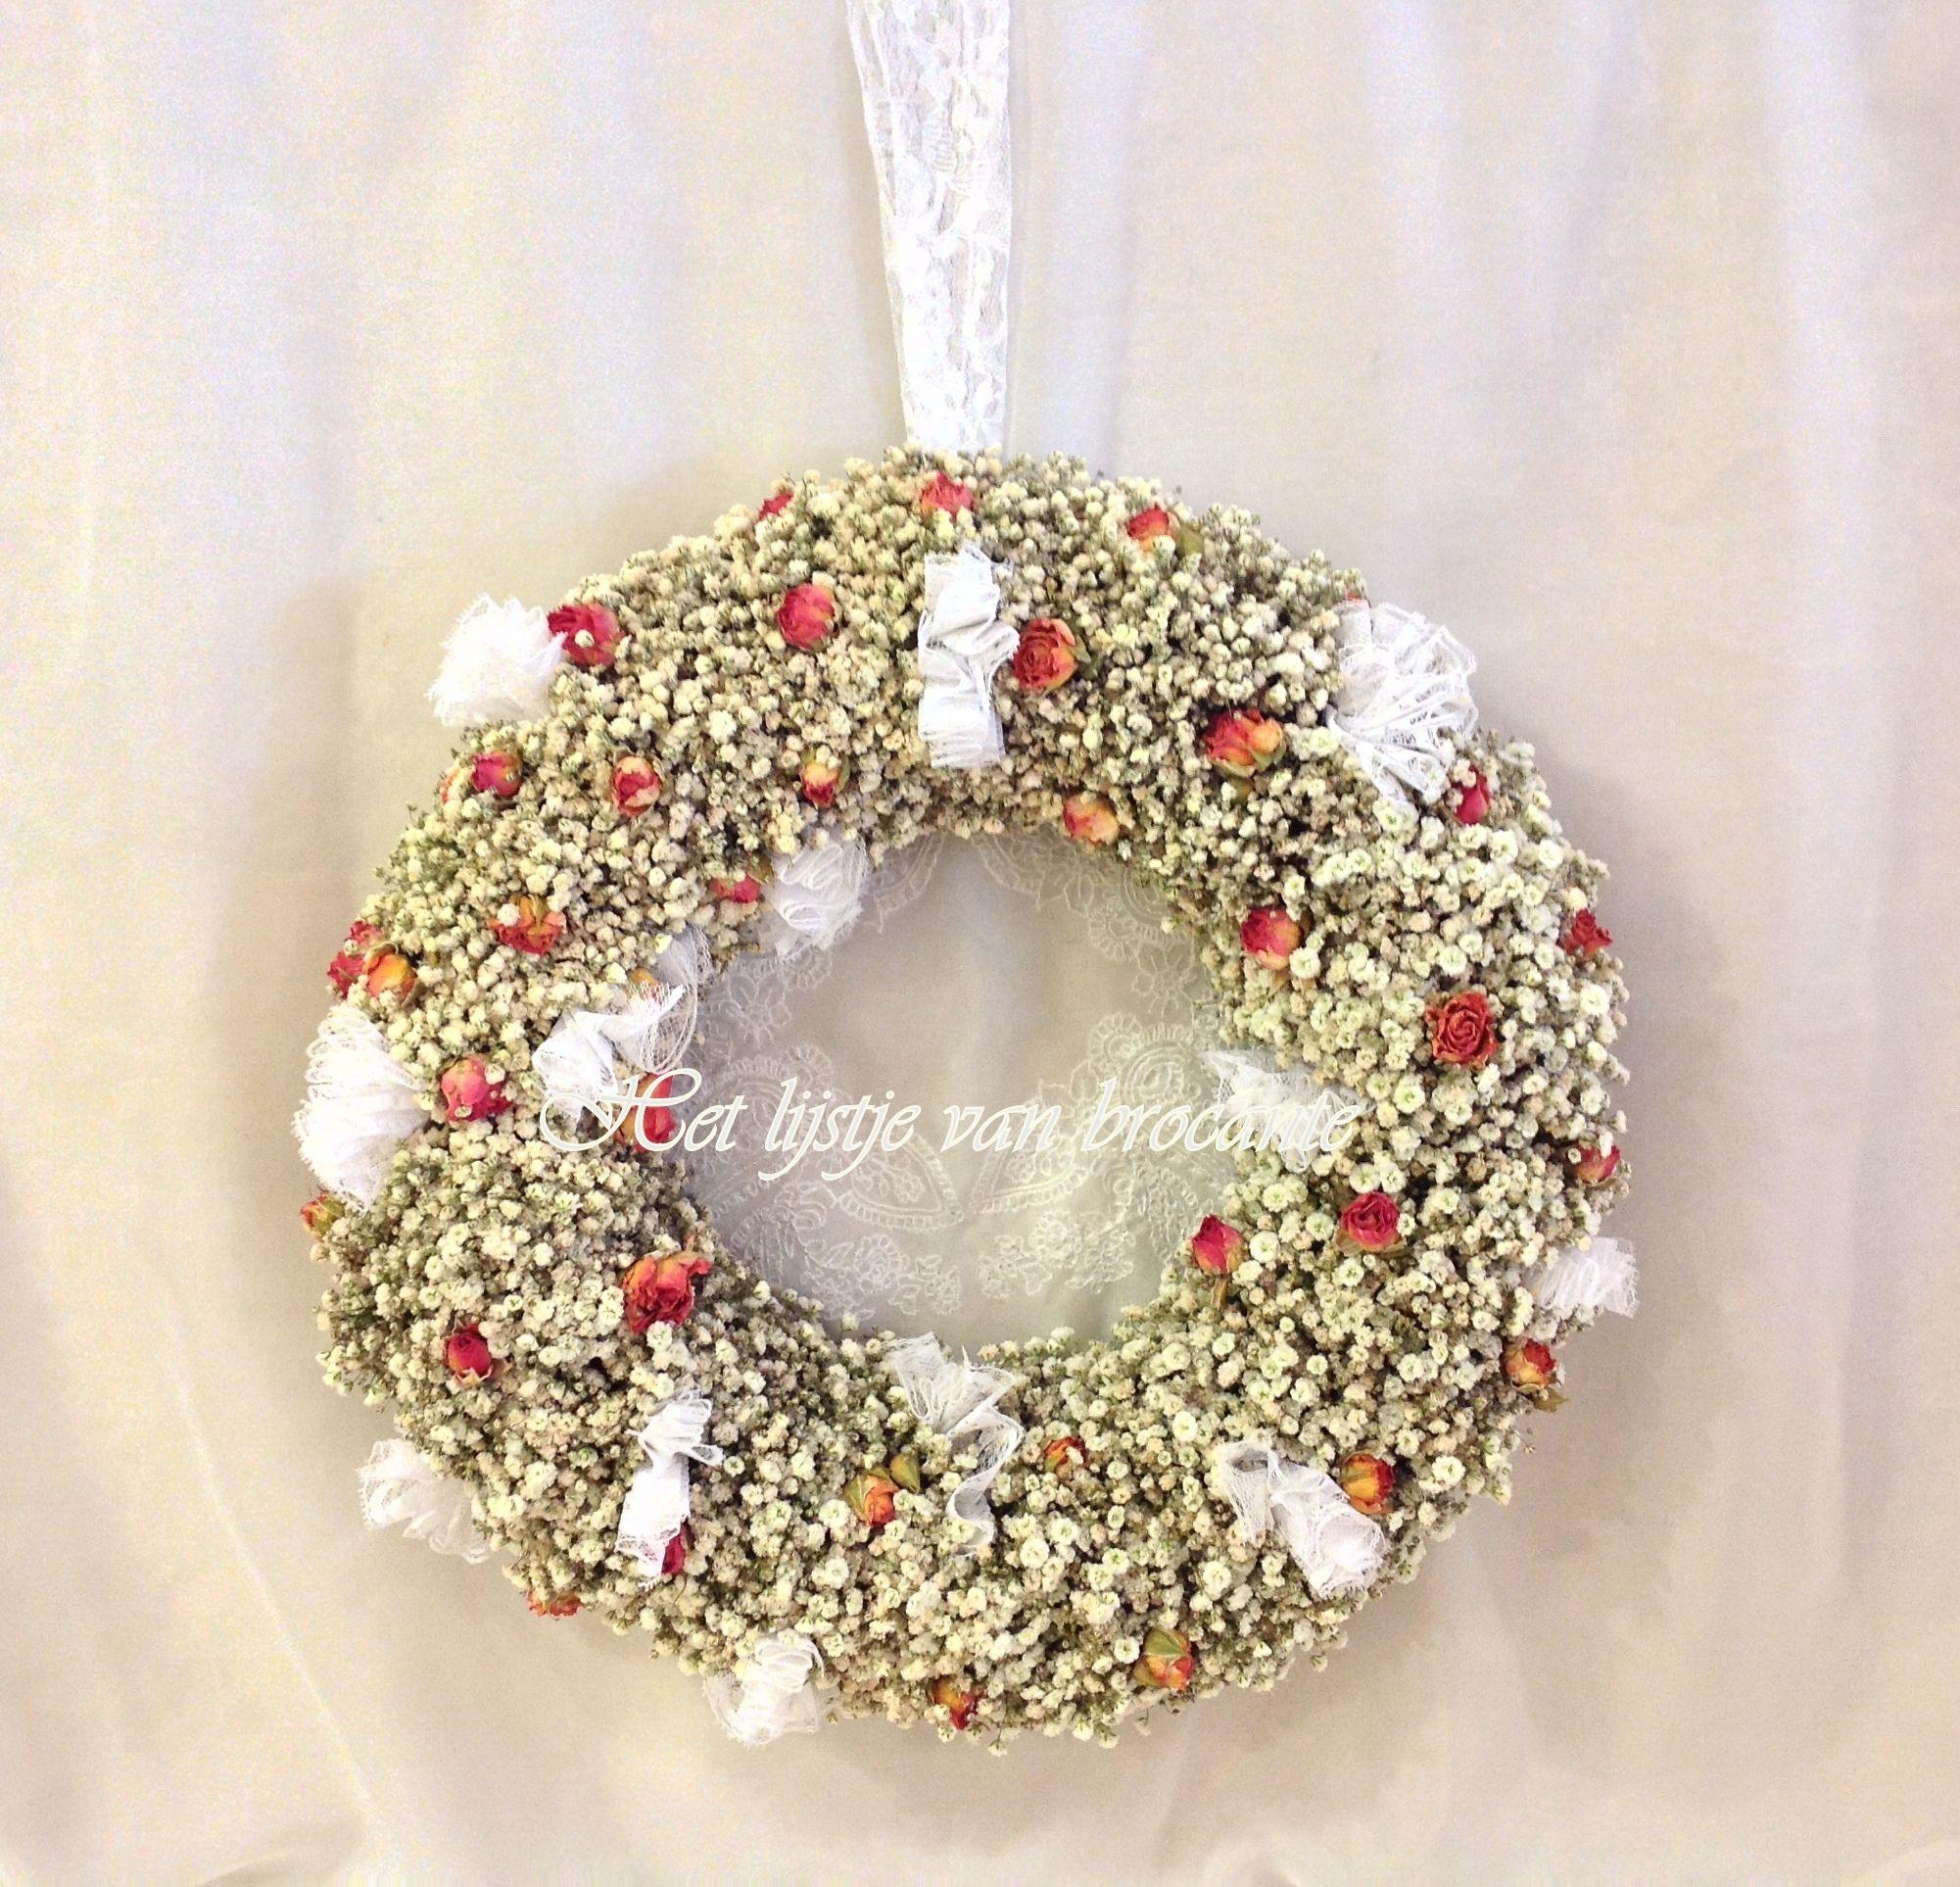 Homemade flea wreath......